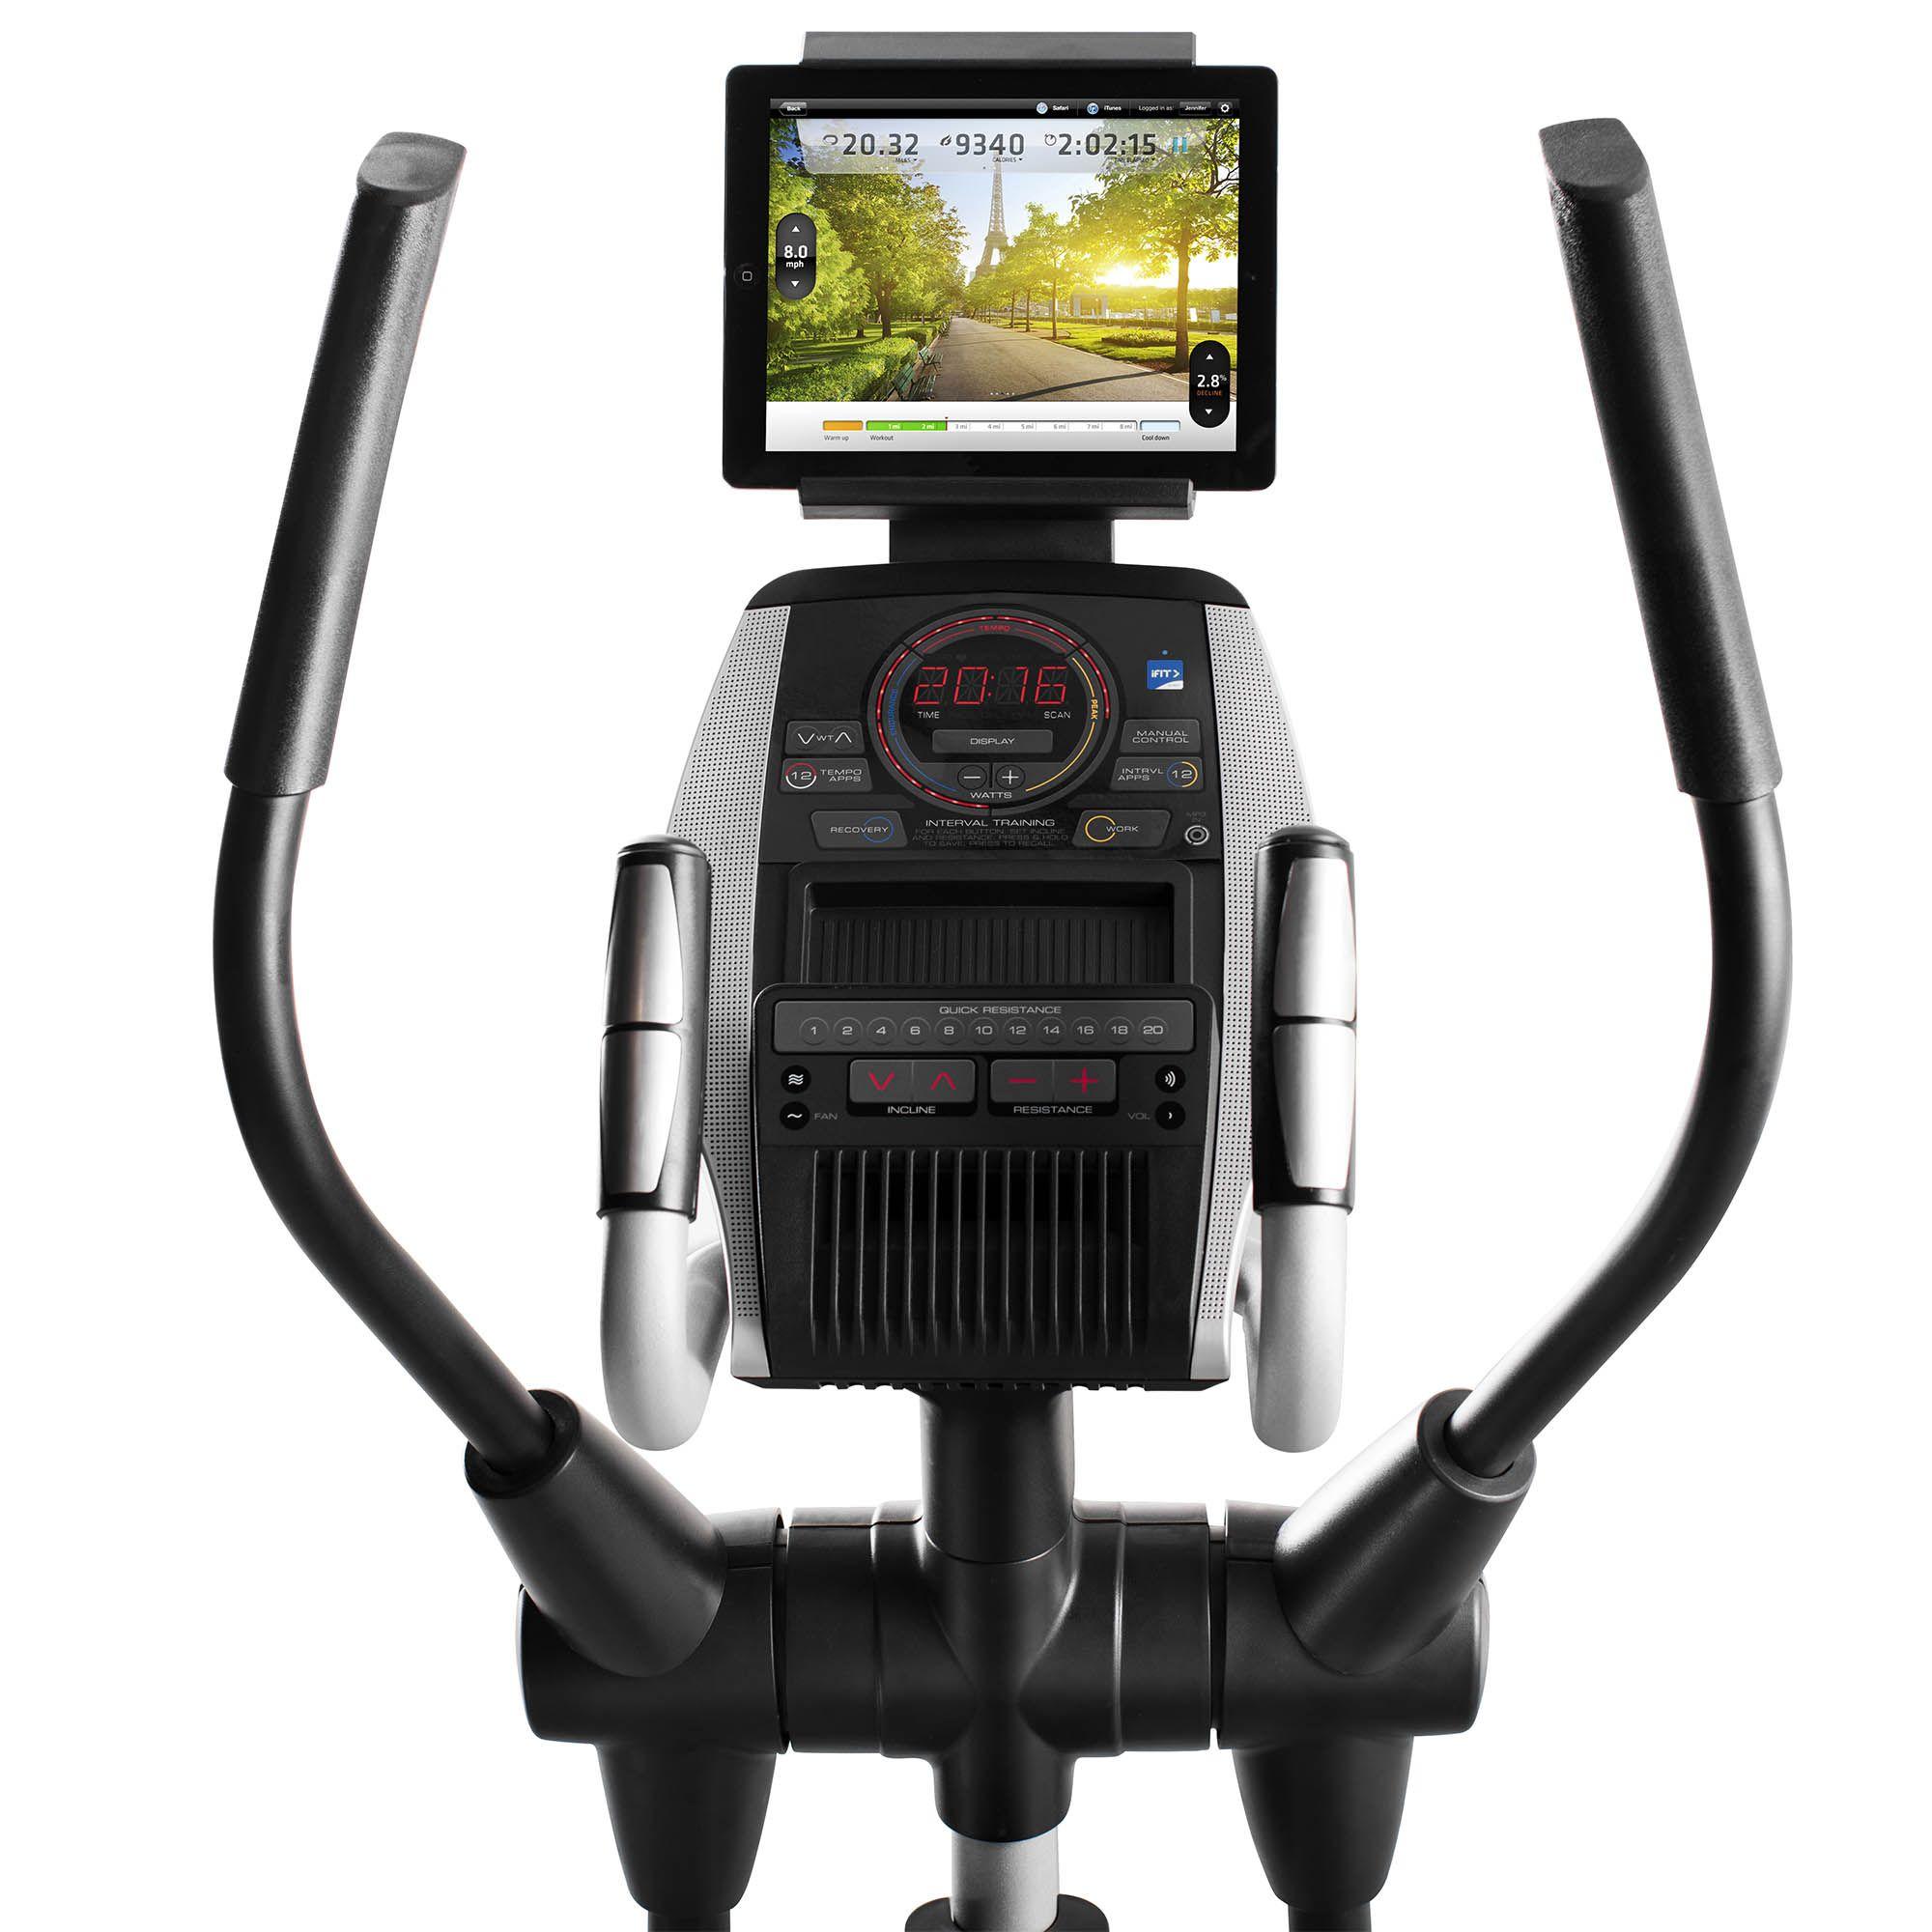 ProForm Smart Strider 695 CSE Elliptical Cross Trainer